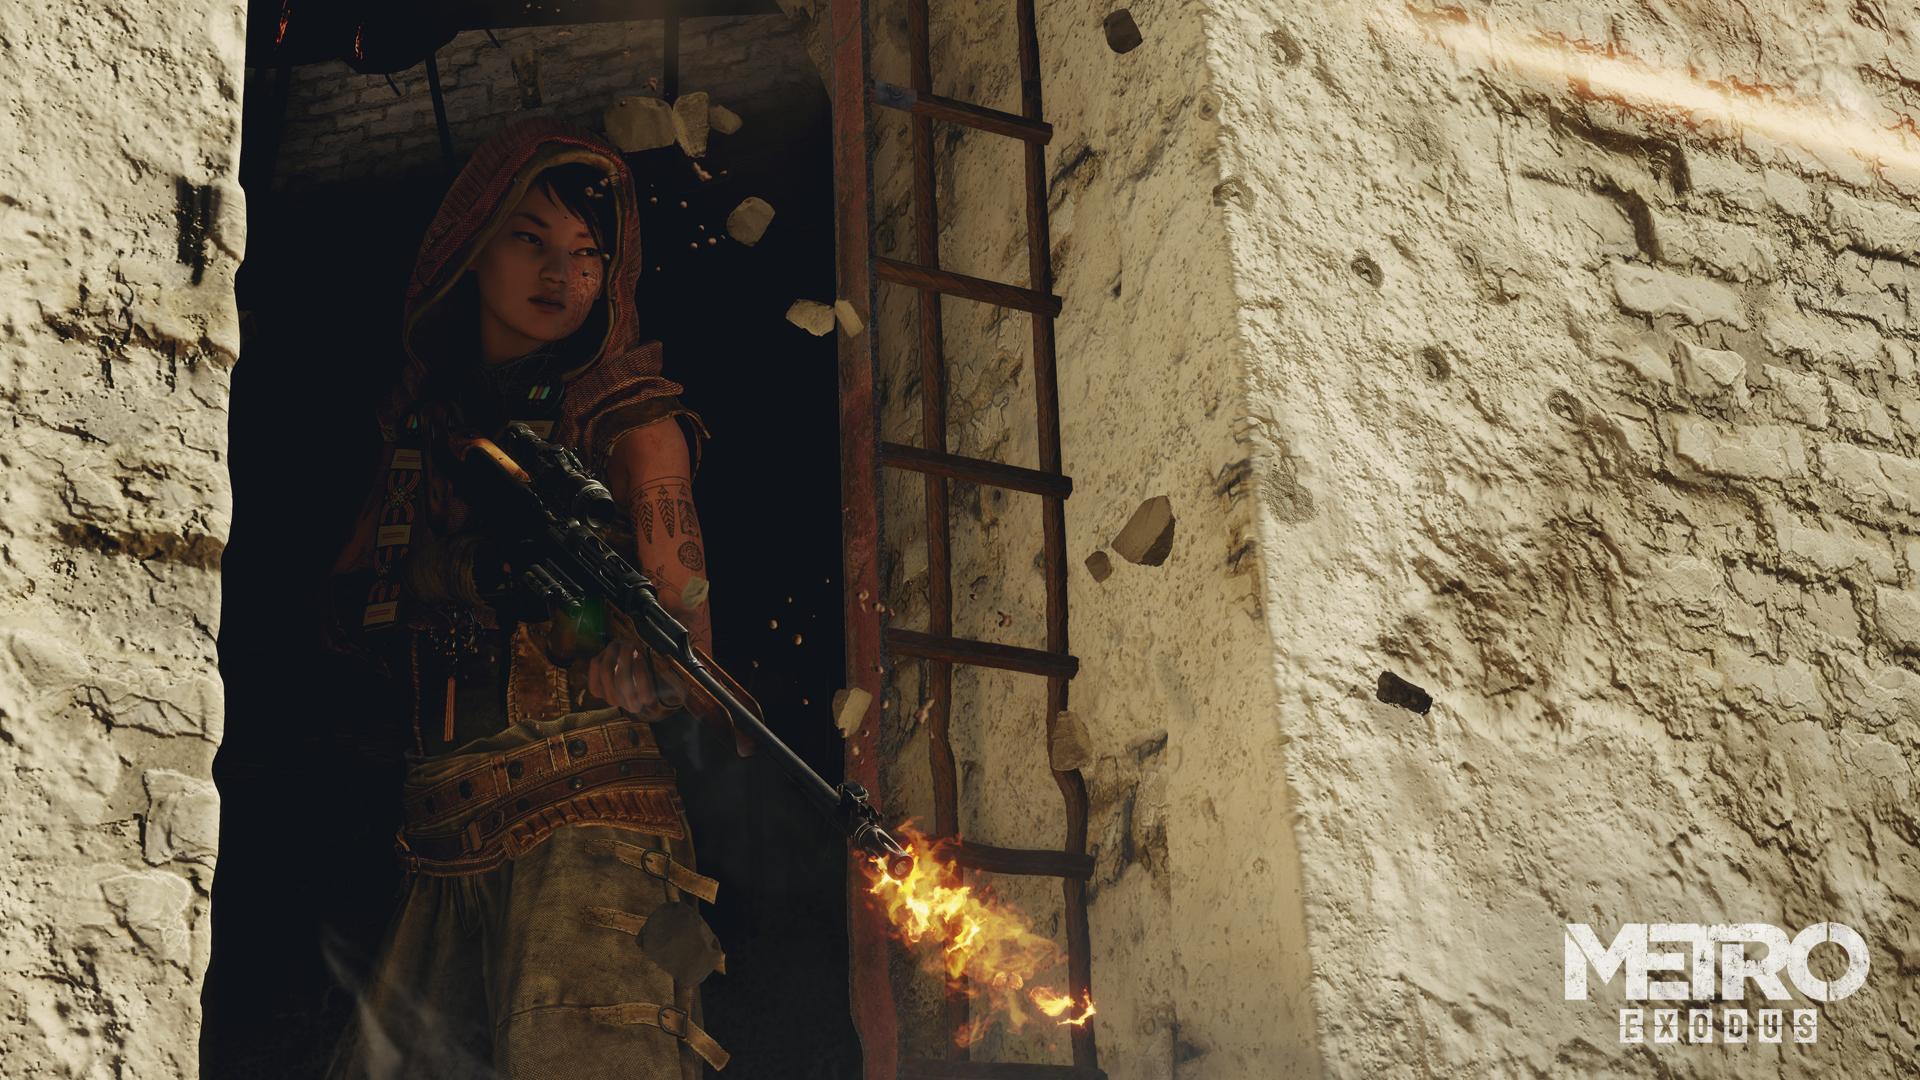 February game releases 2019 Metro Exodus image